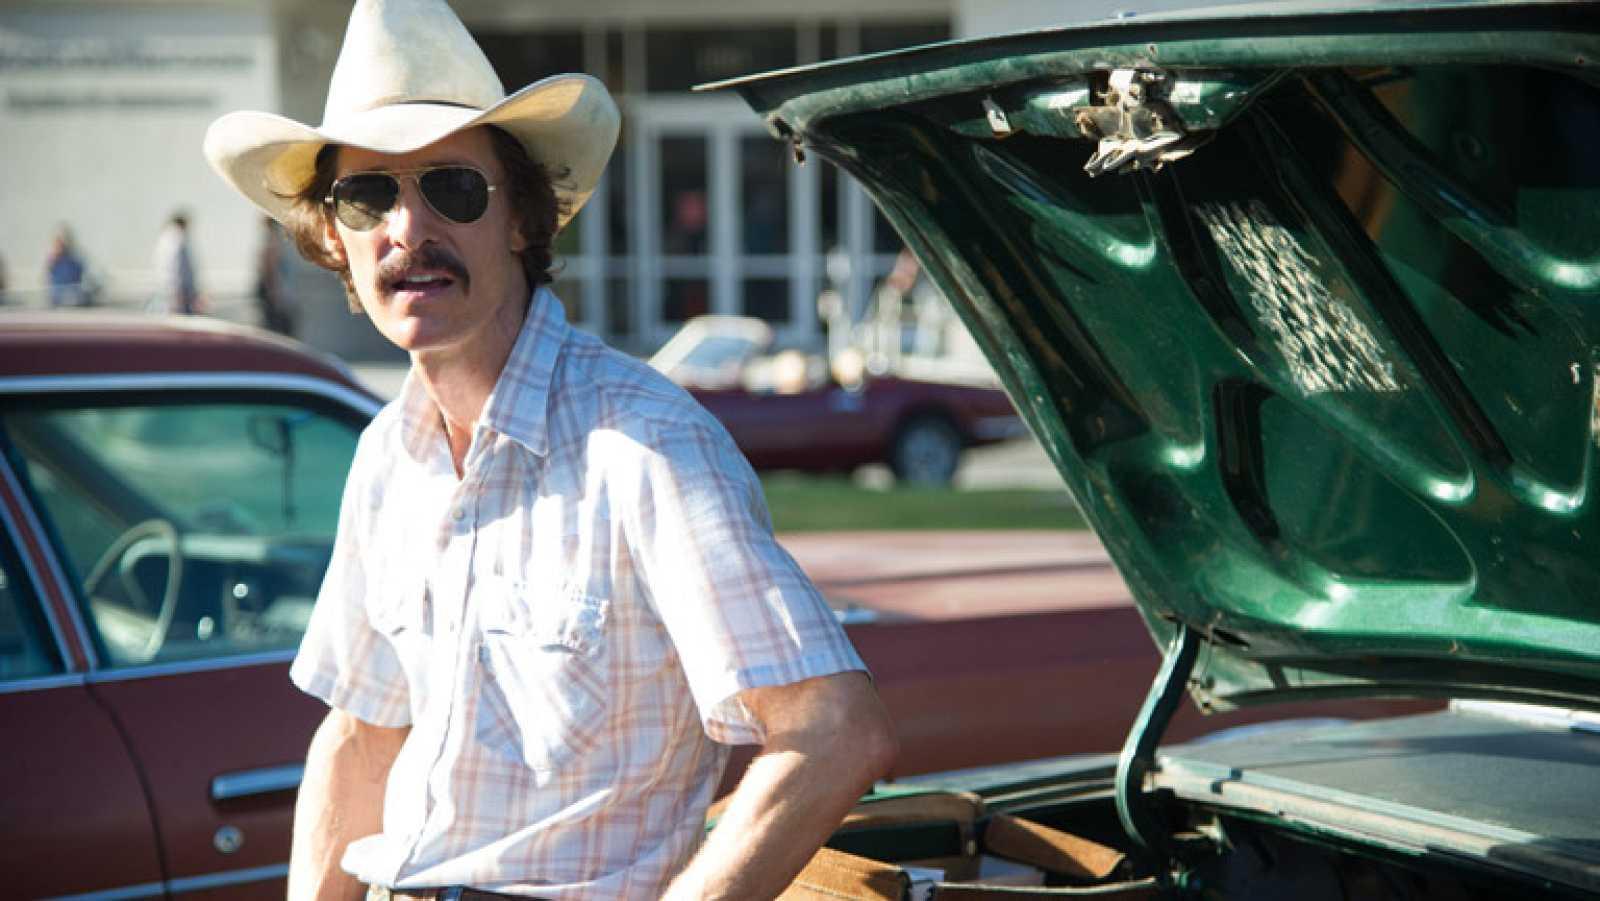 Tráiler de 'Dallas Buyers Club', película ganadora de tres Oscar